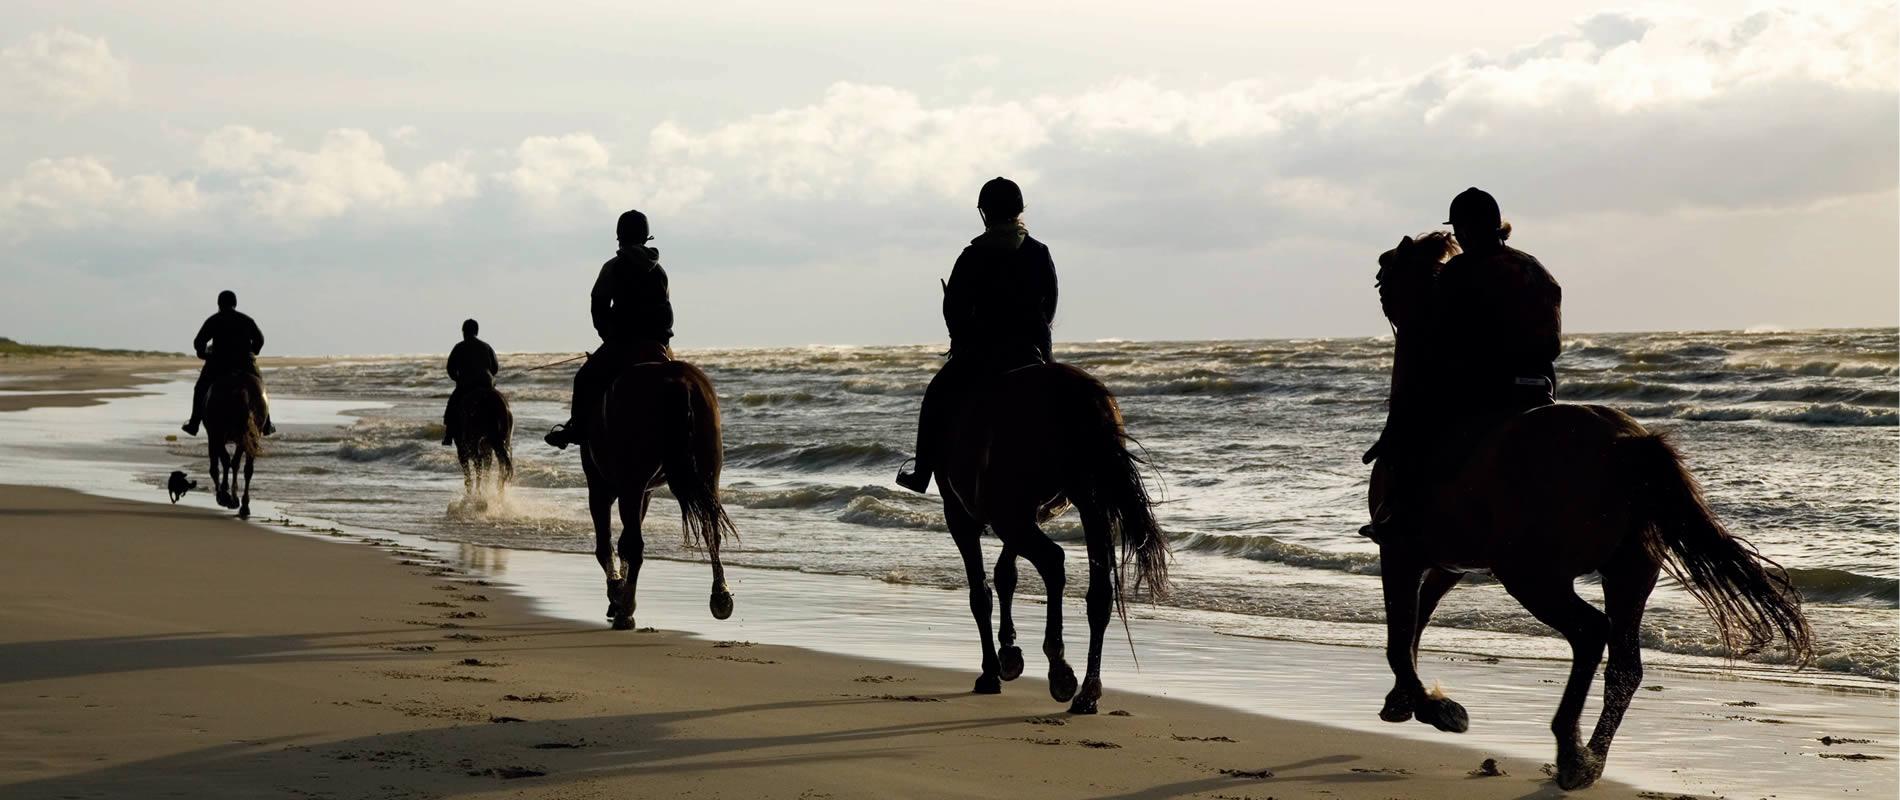 Riding - Puglia